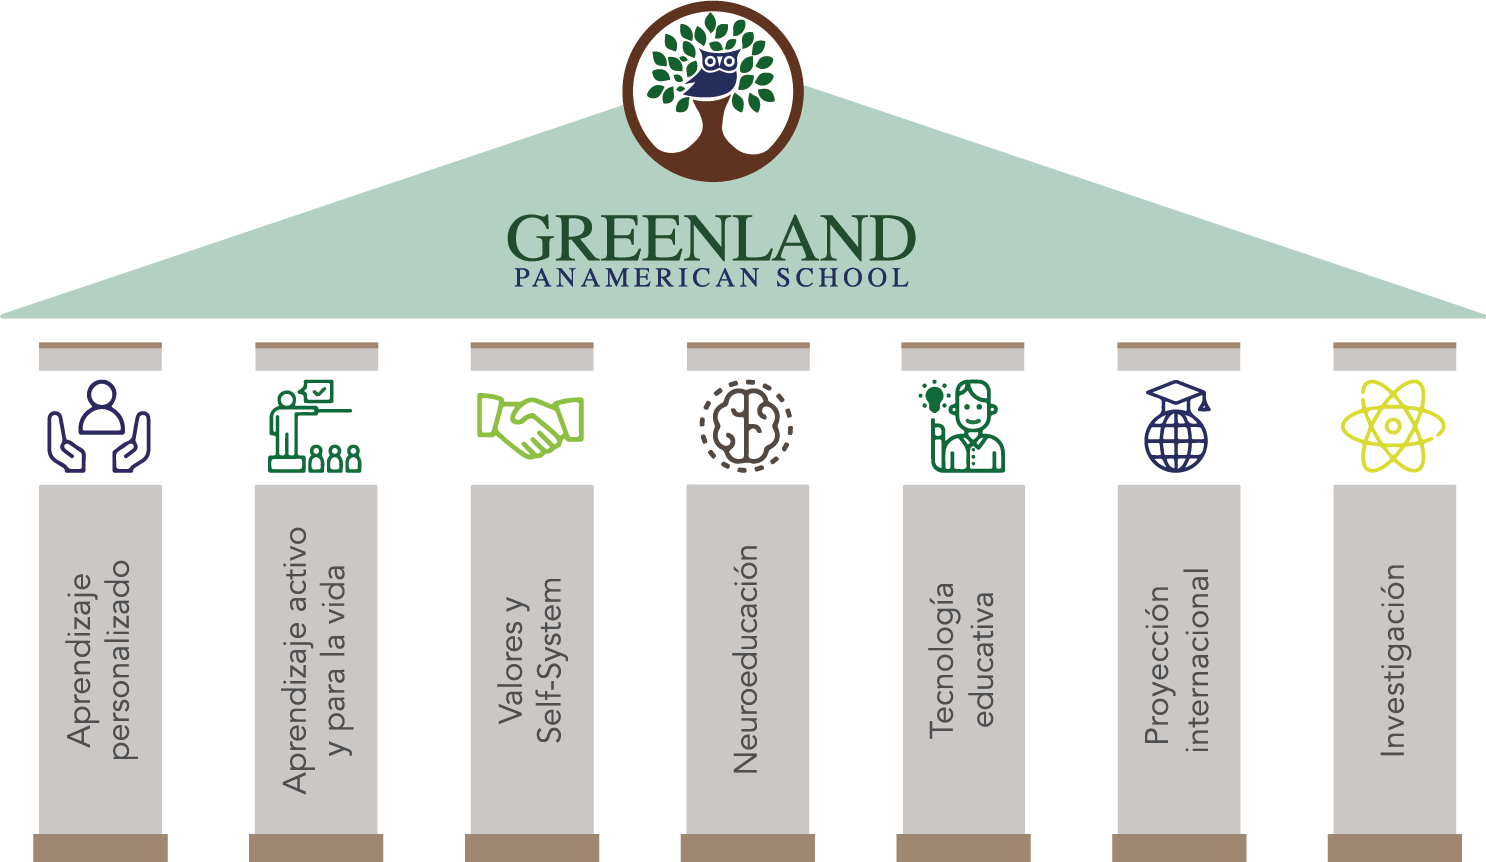 pilares-greenland